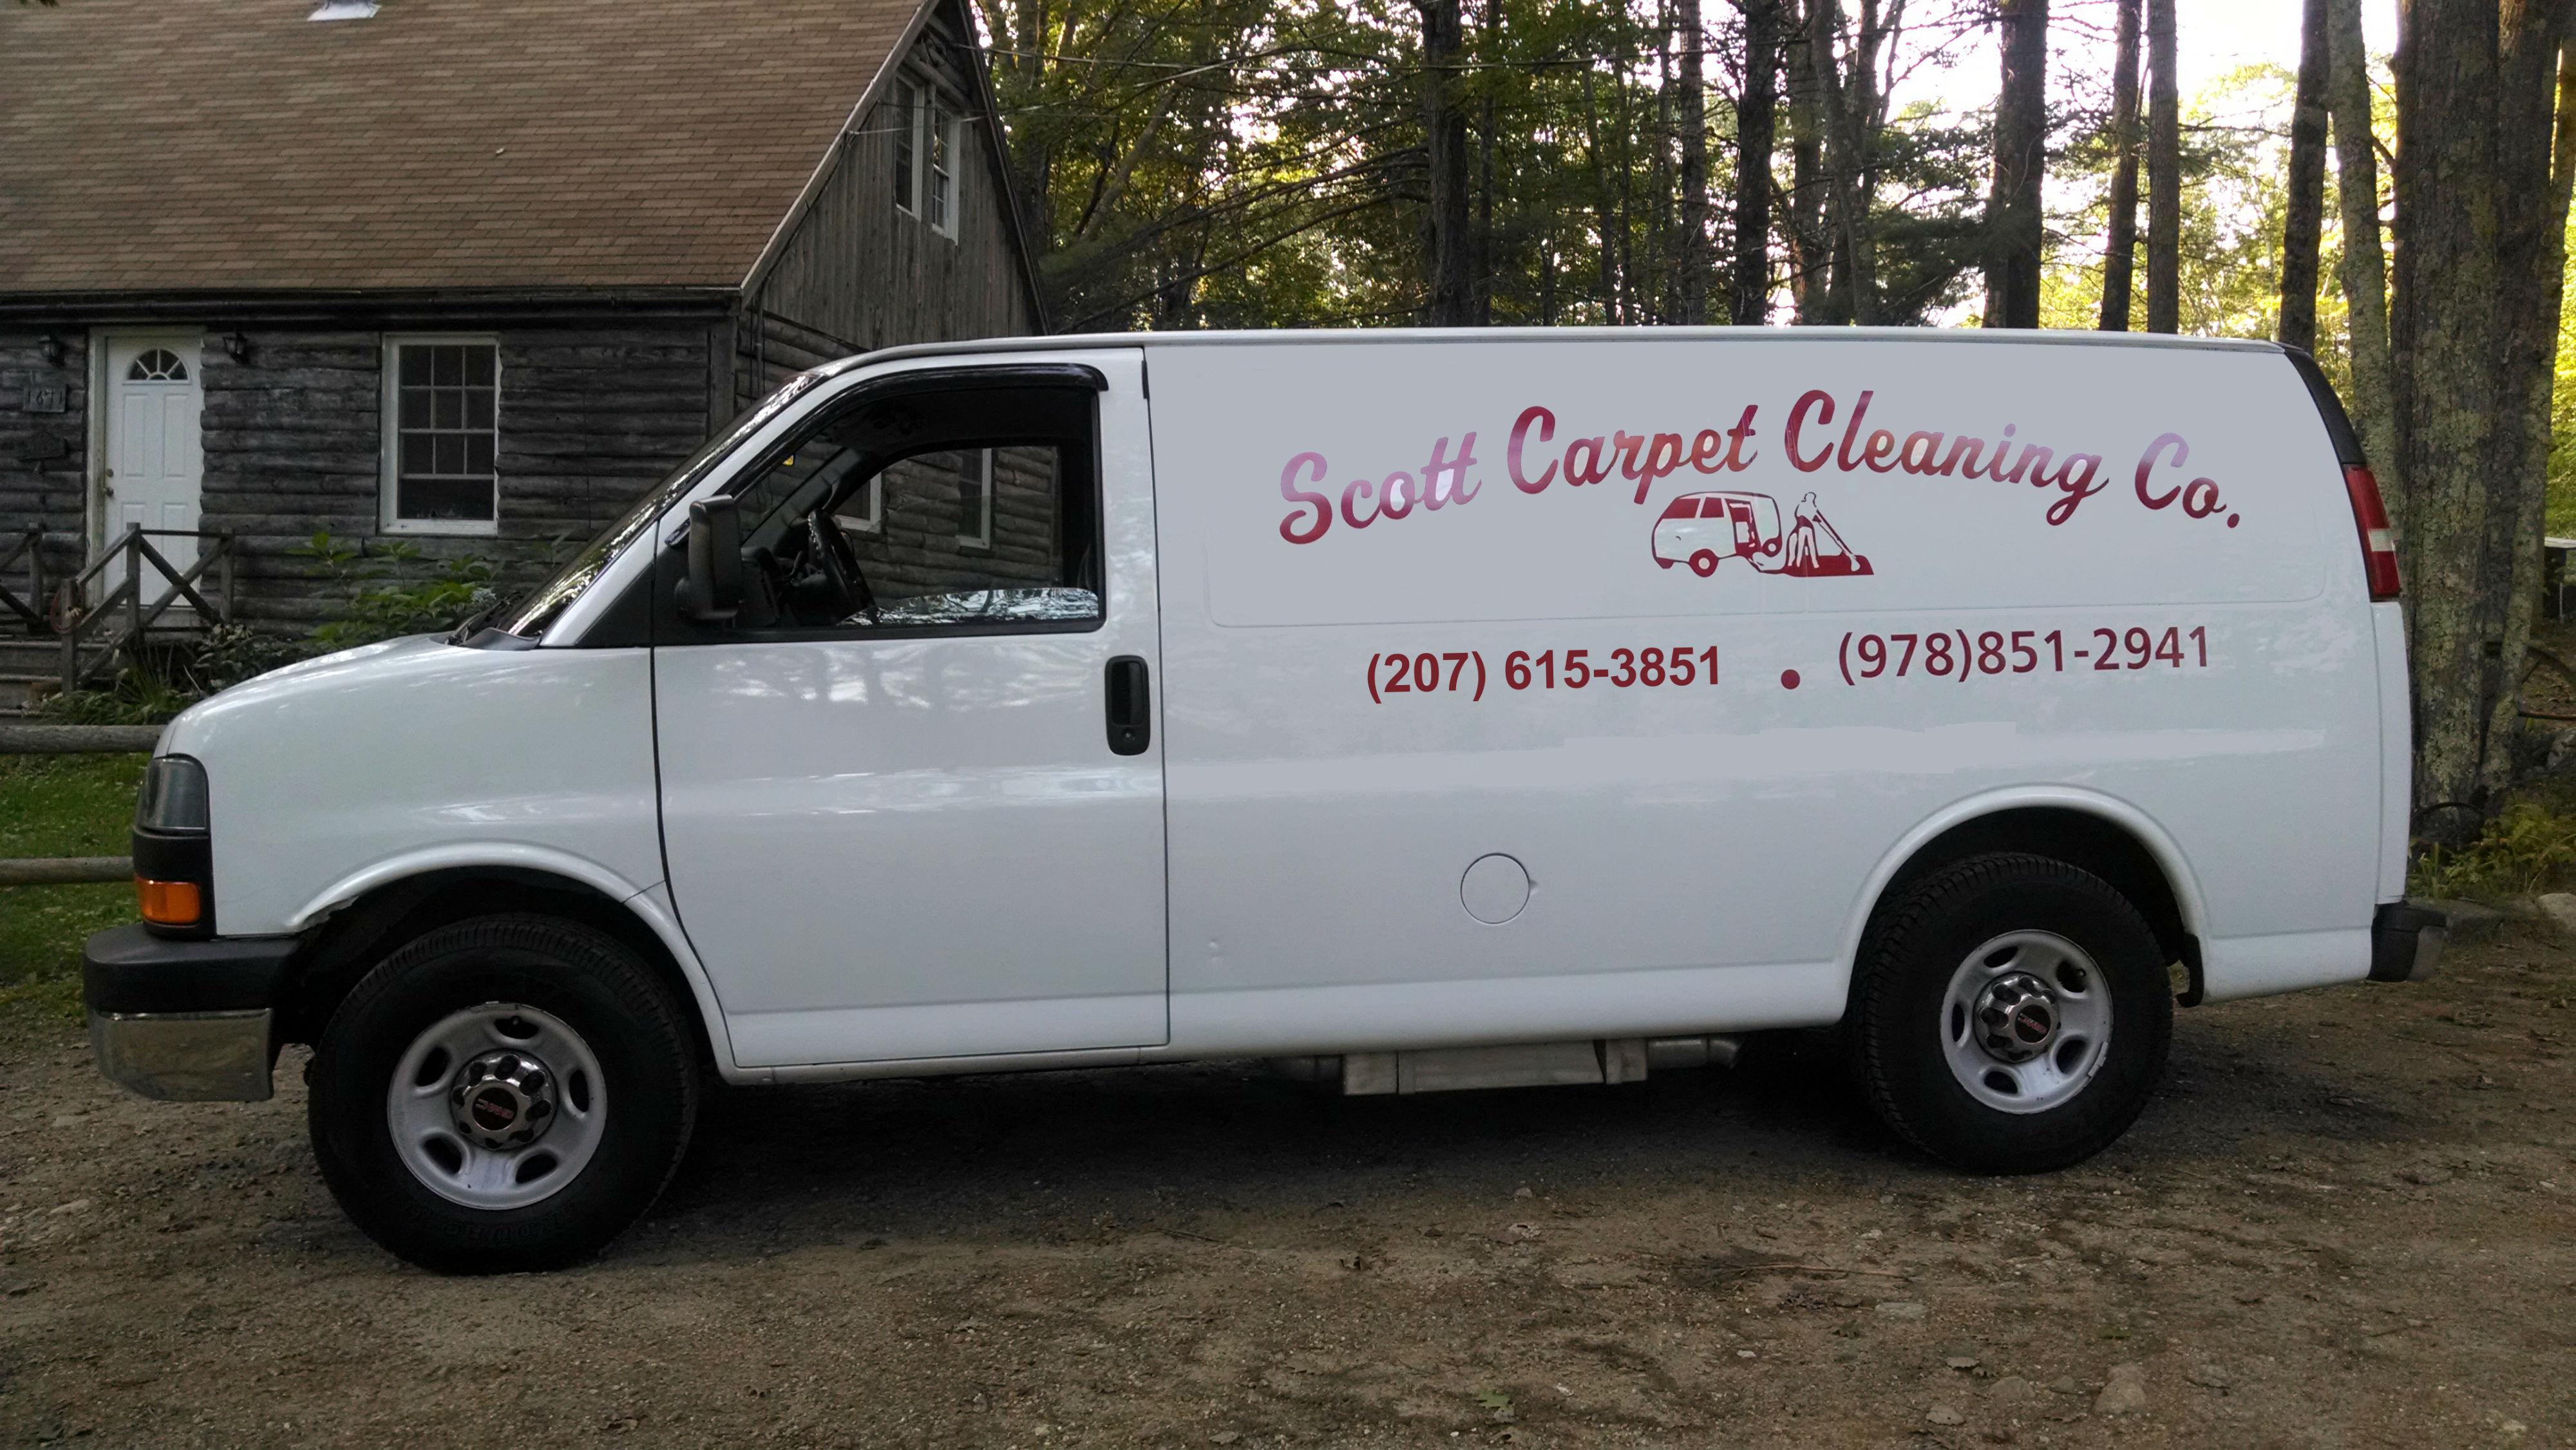 Scott Carpet Cleaning Co image 0